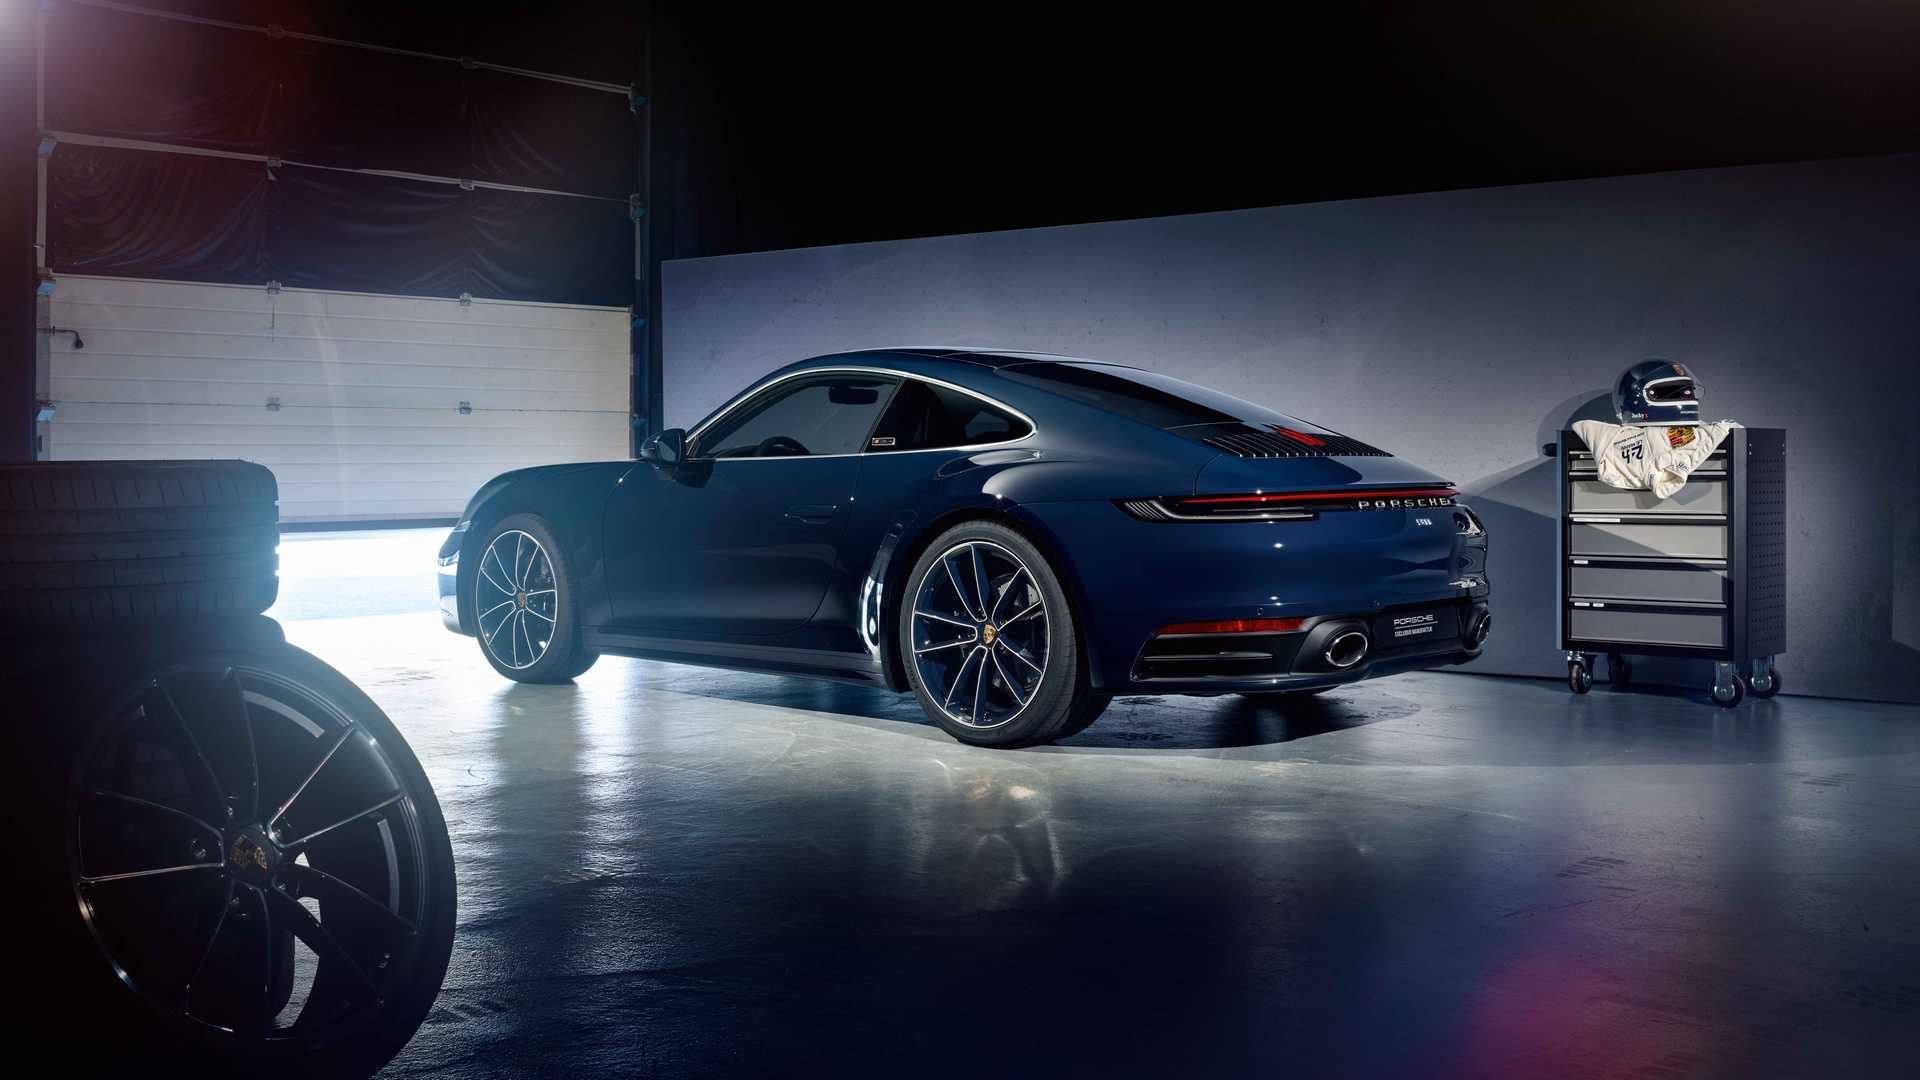 Ra mắt Porsche 911 phiên bản đặc biệt Belgian Legend - 3